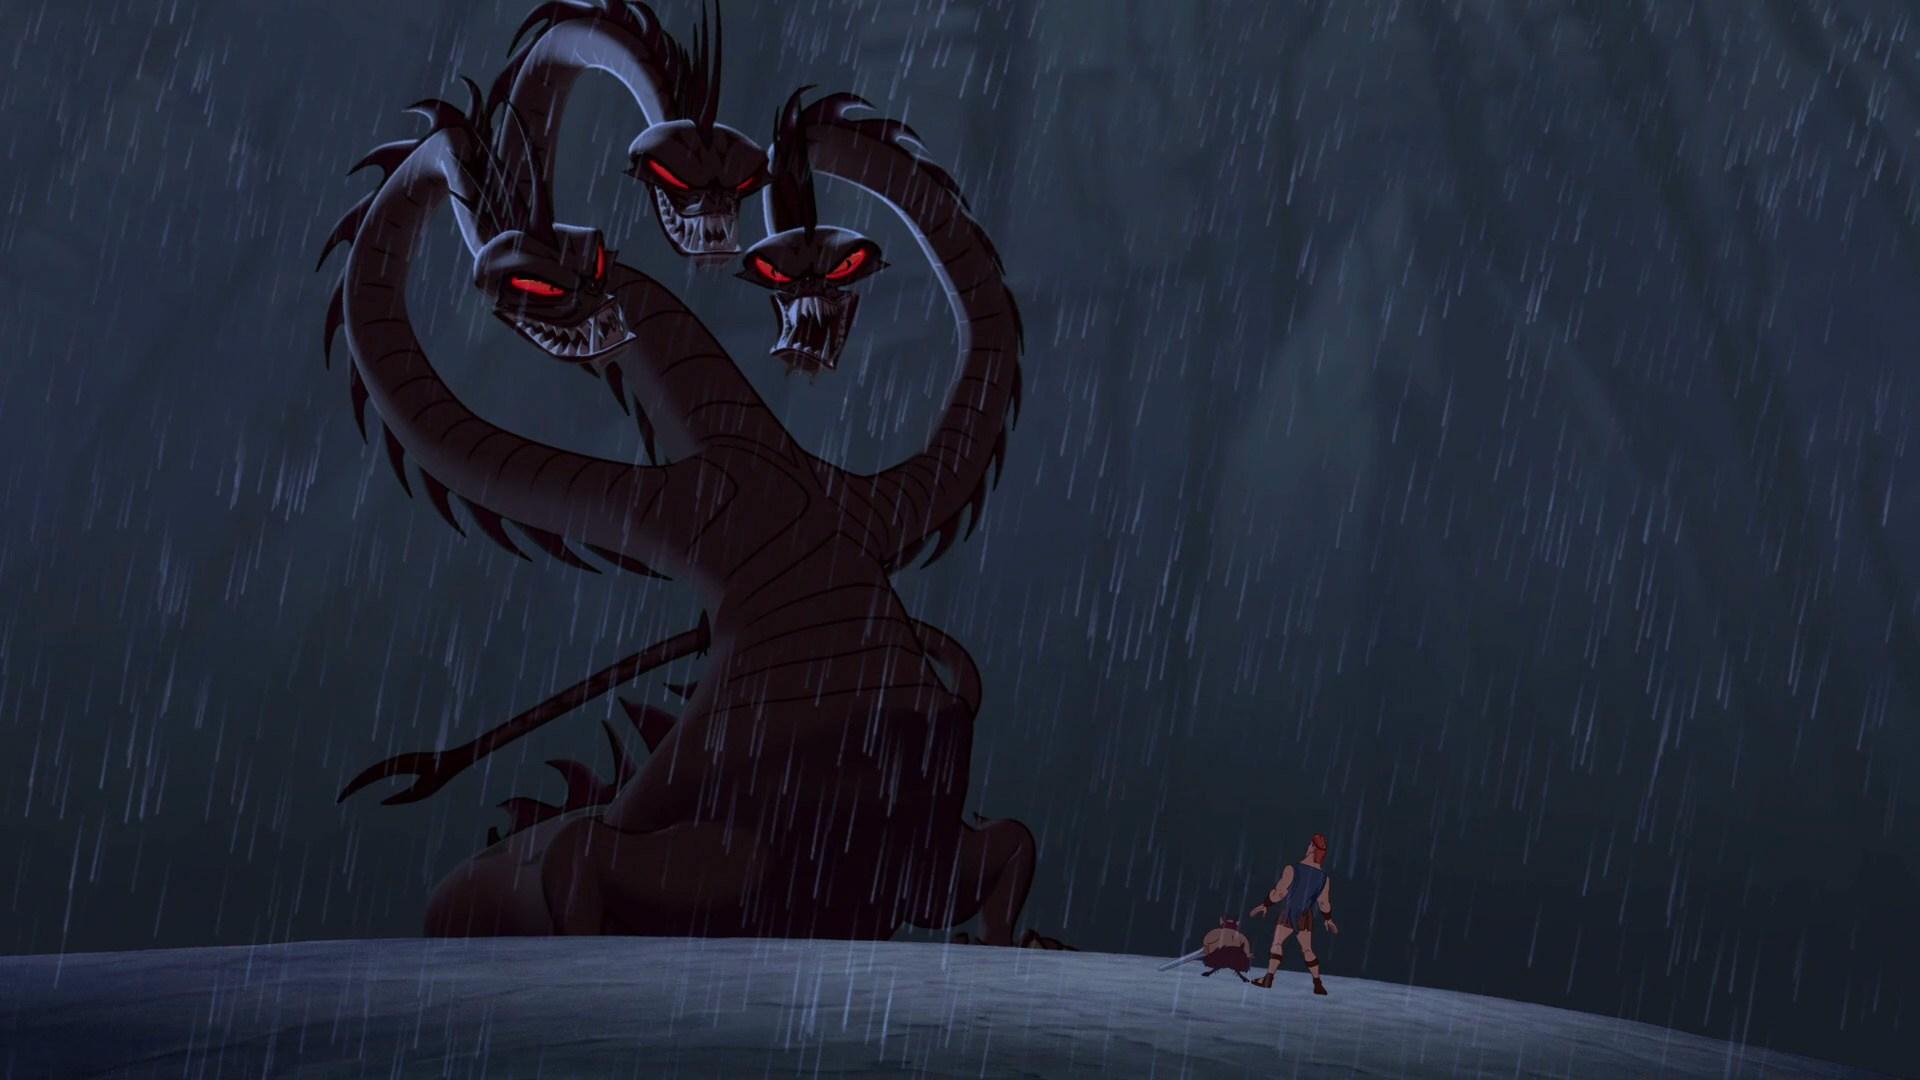 File:Hydra Battle.jpg